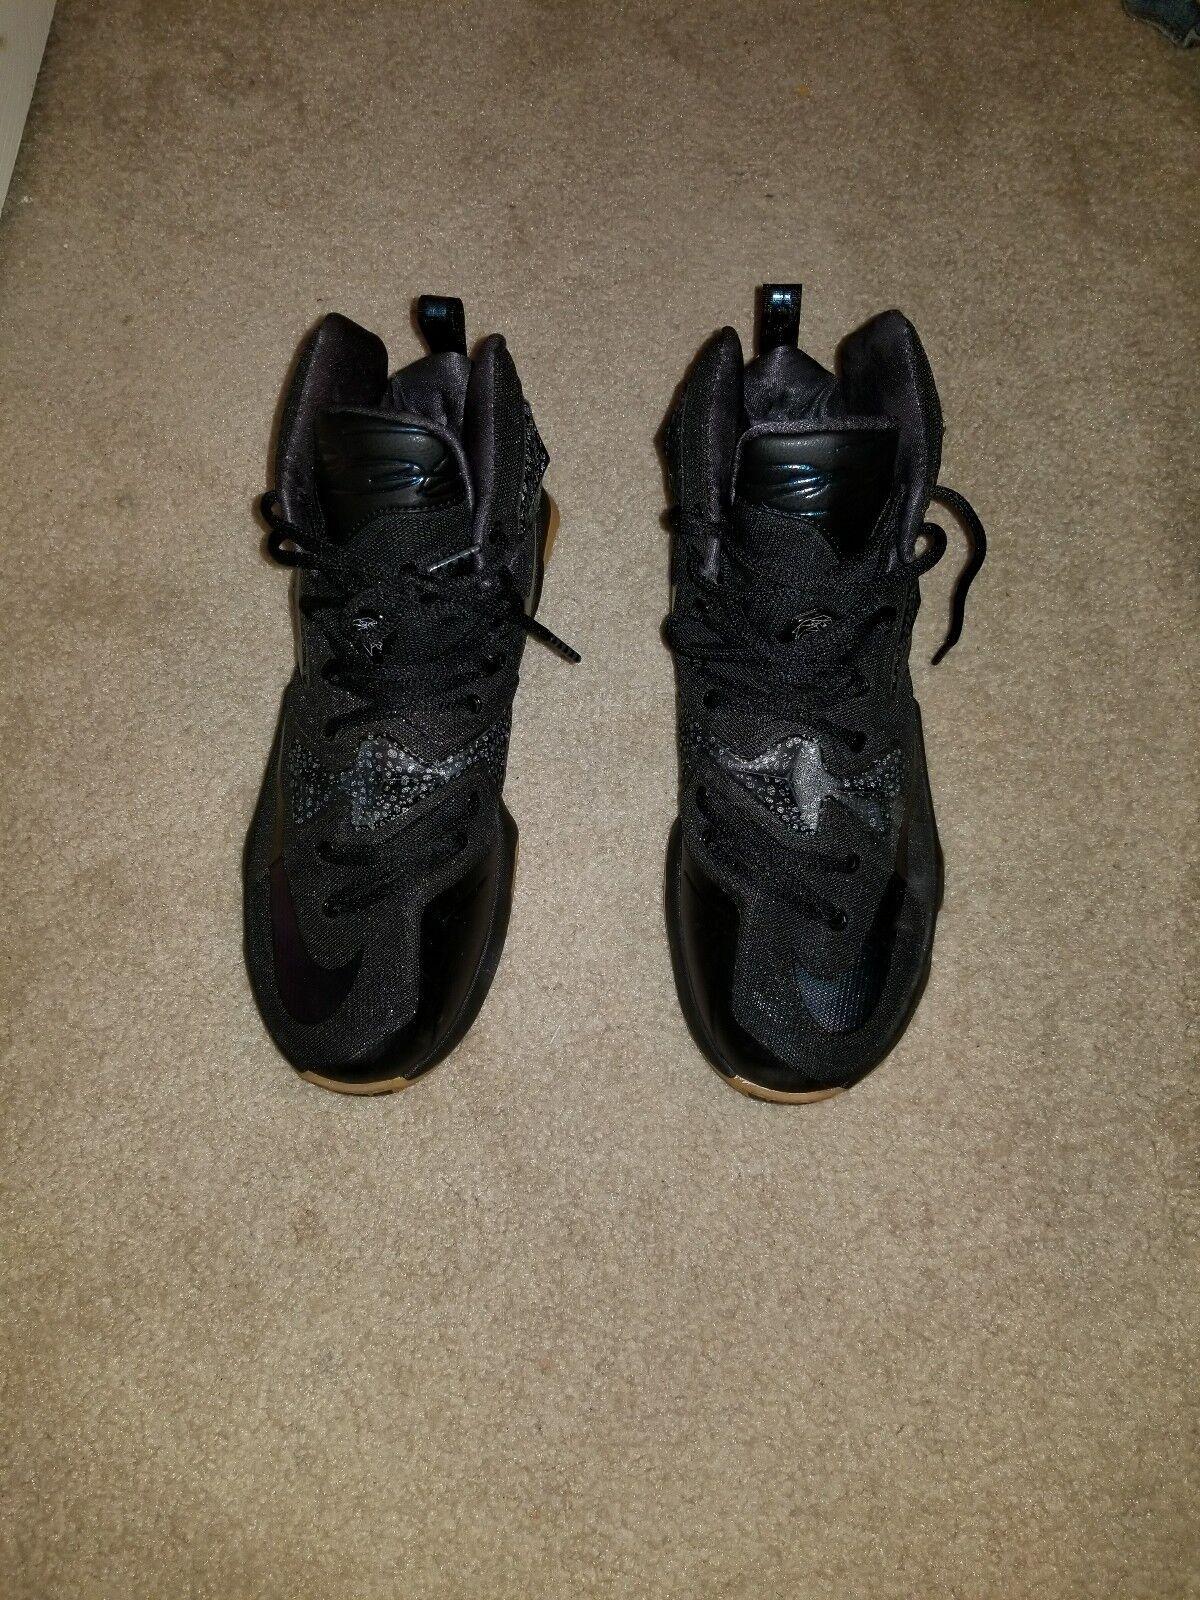 Nike Lebron XIII Black Lion Black Anthracite Gum size 9.5. Hard to find black